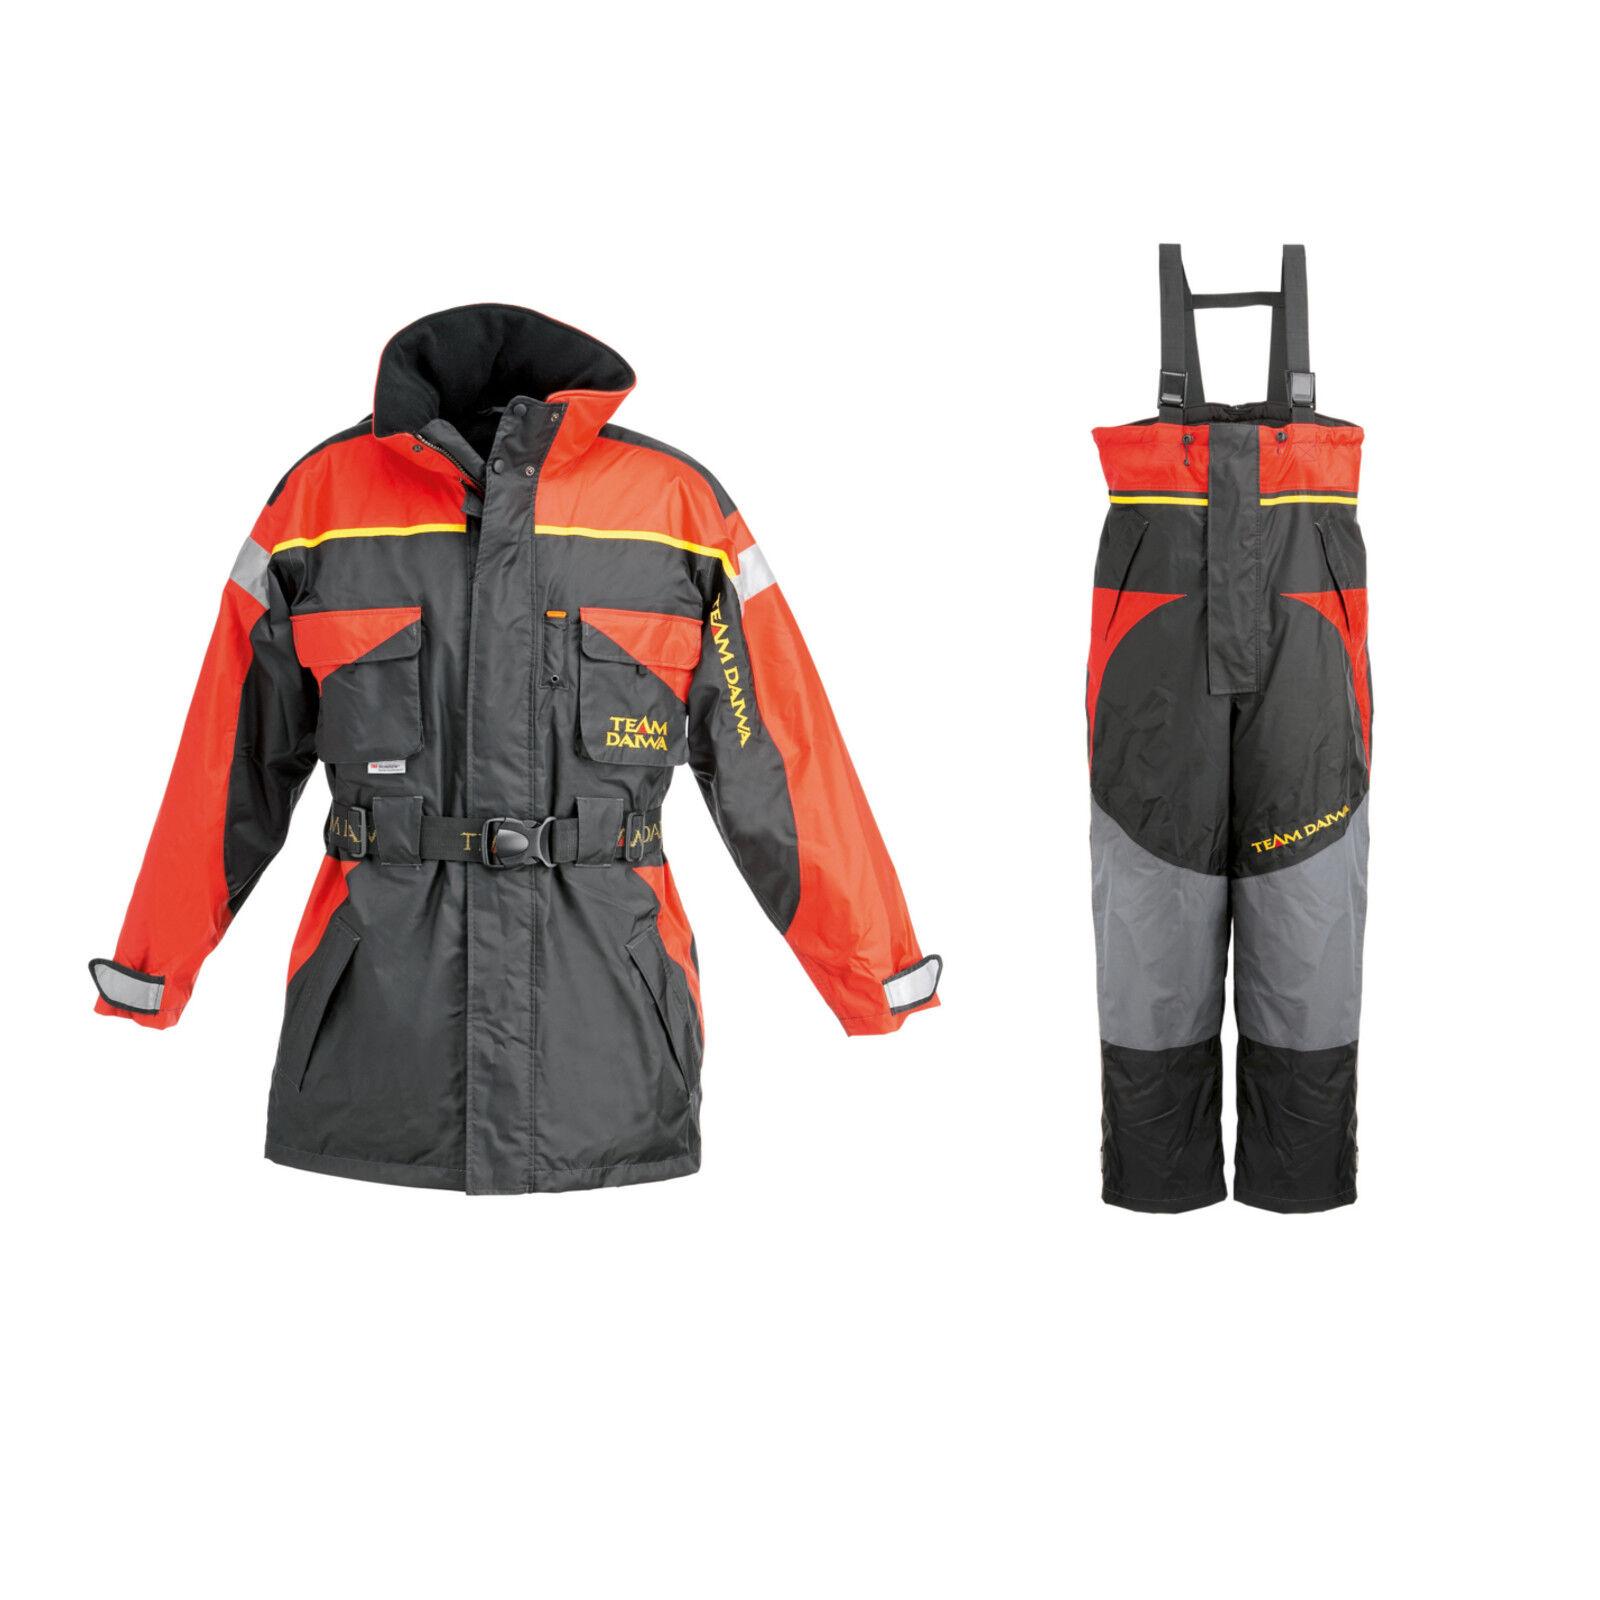 Daiwa Floating Suit Angeln - TD Angeln Suit Schwimmanzug 2 Teiler - Gr. M b6e063